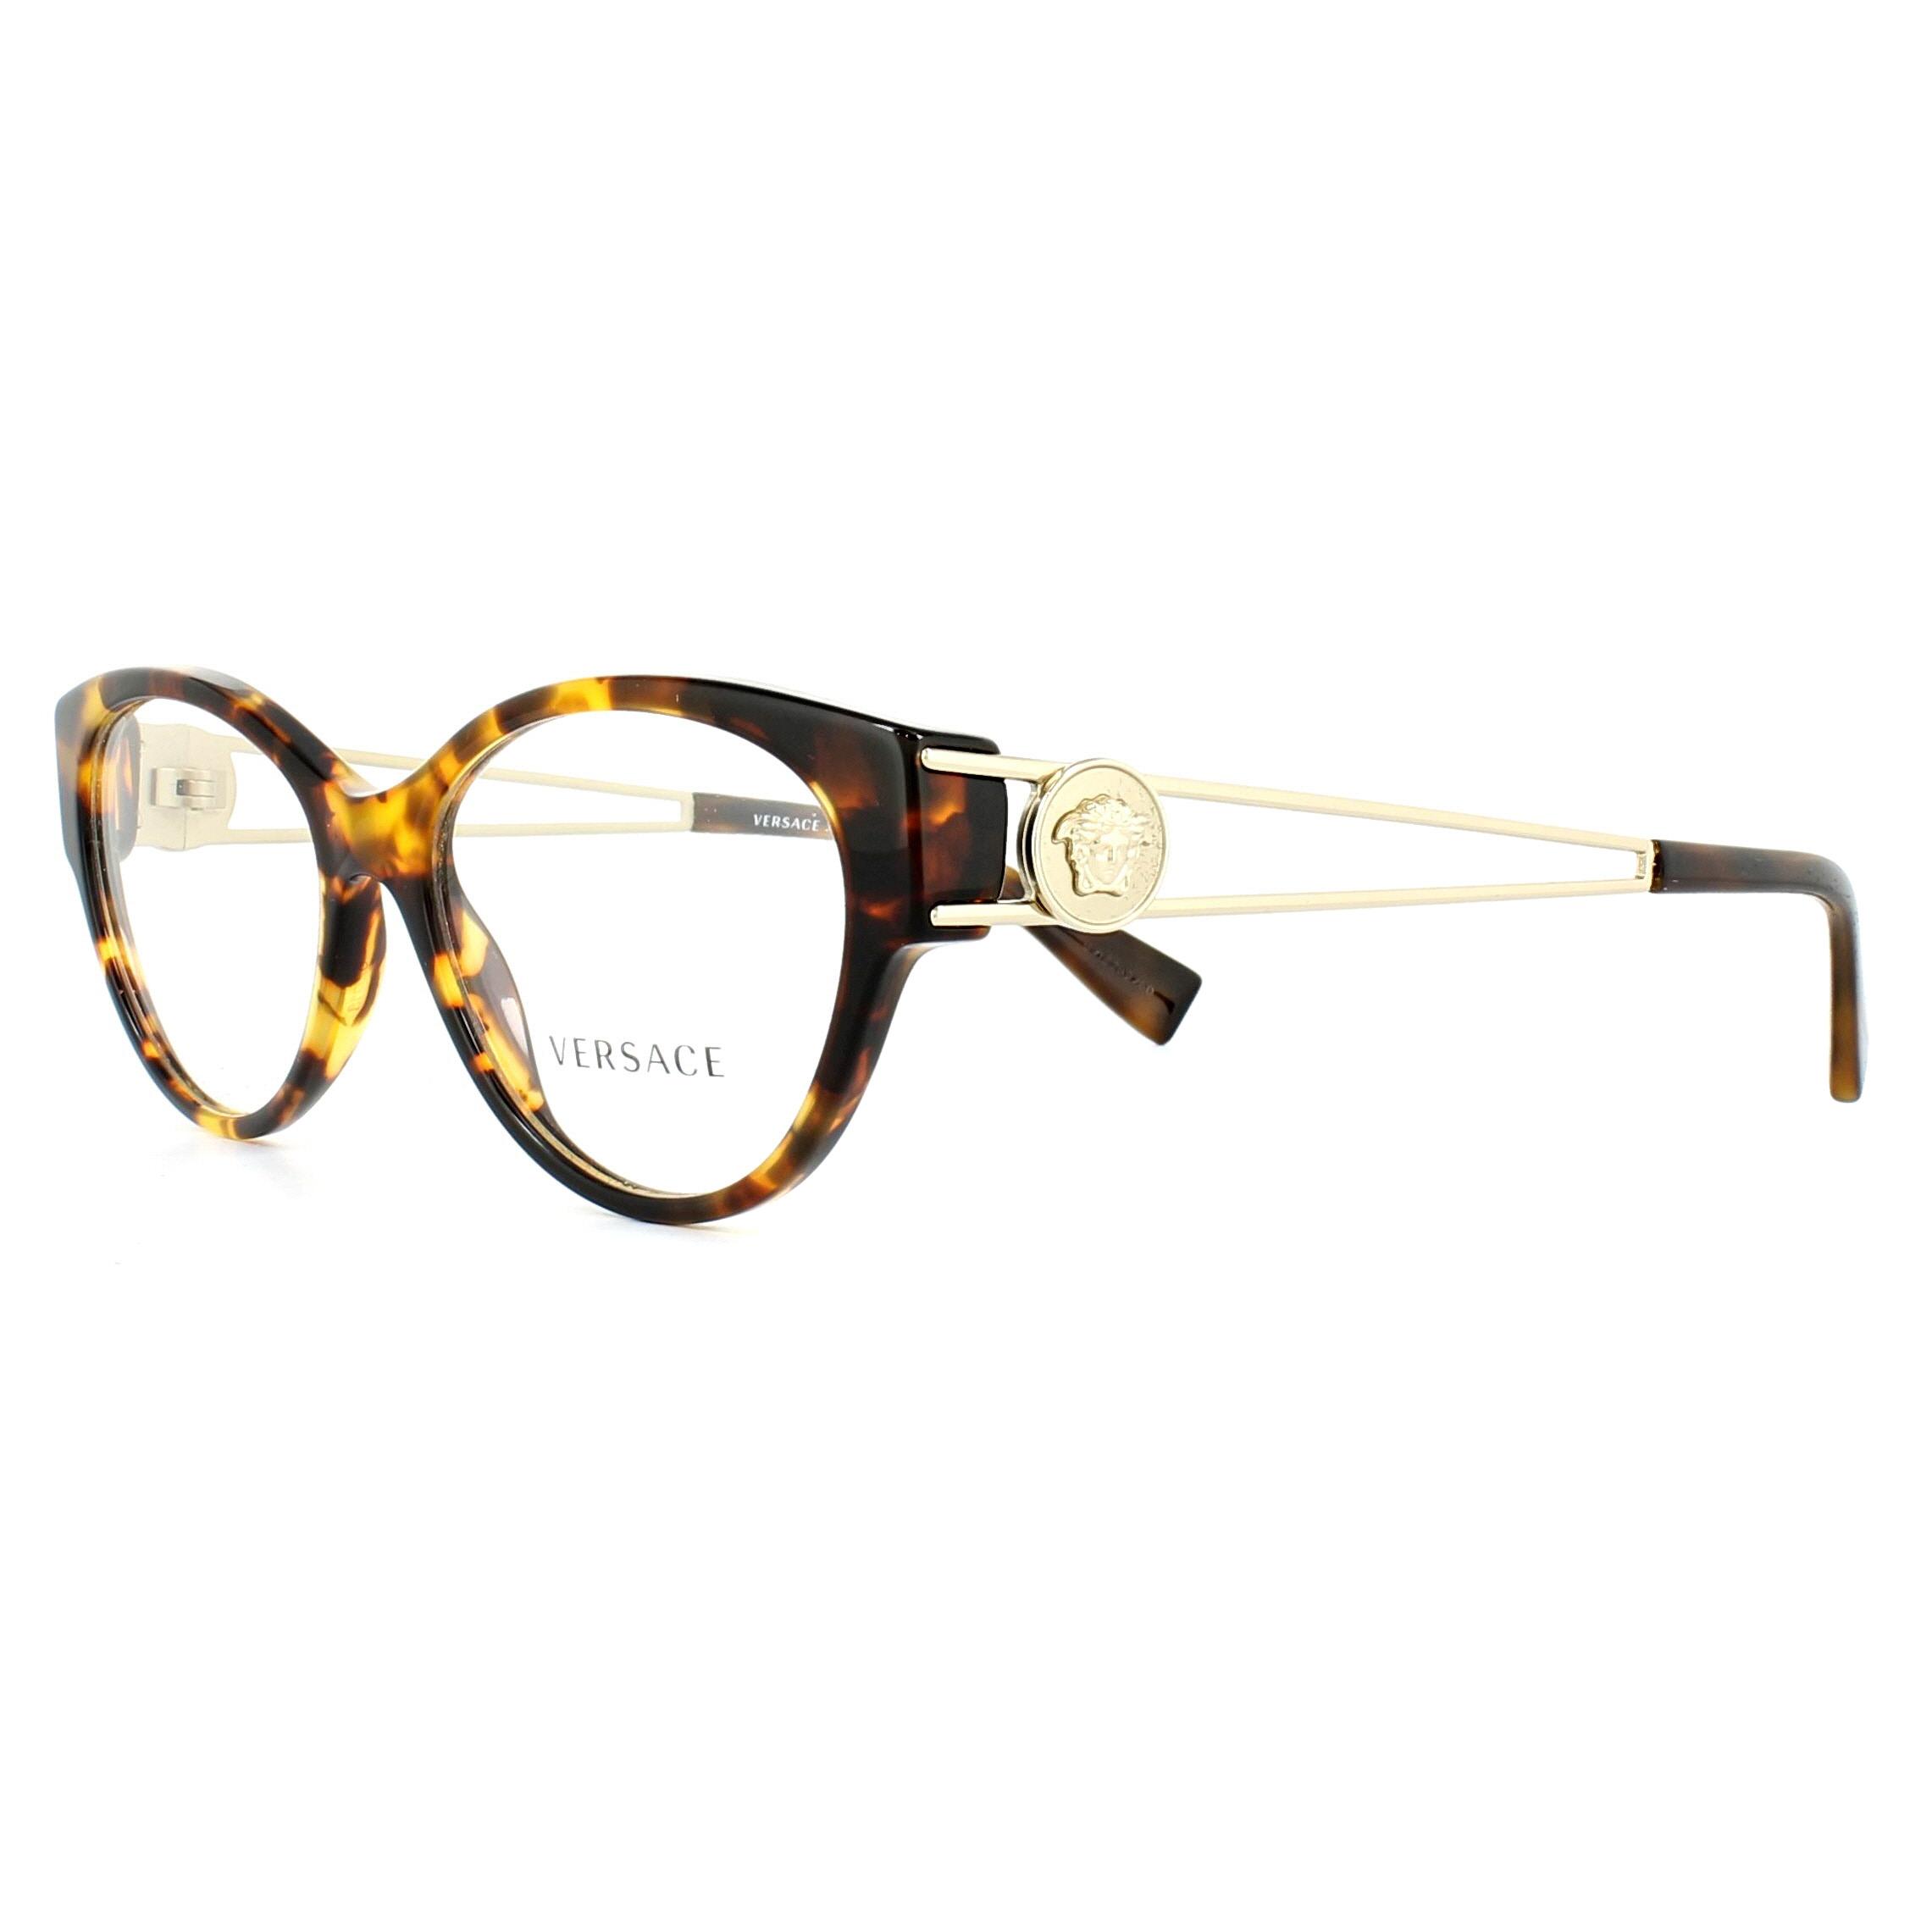 Versace Glasses Frames 3254 5148 Havana 52mm Womens 8053672799866   eBay